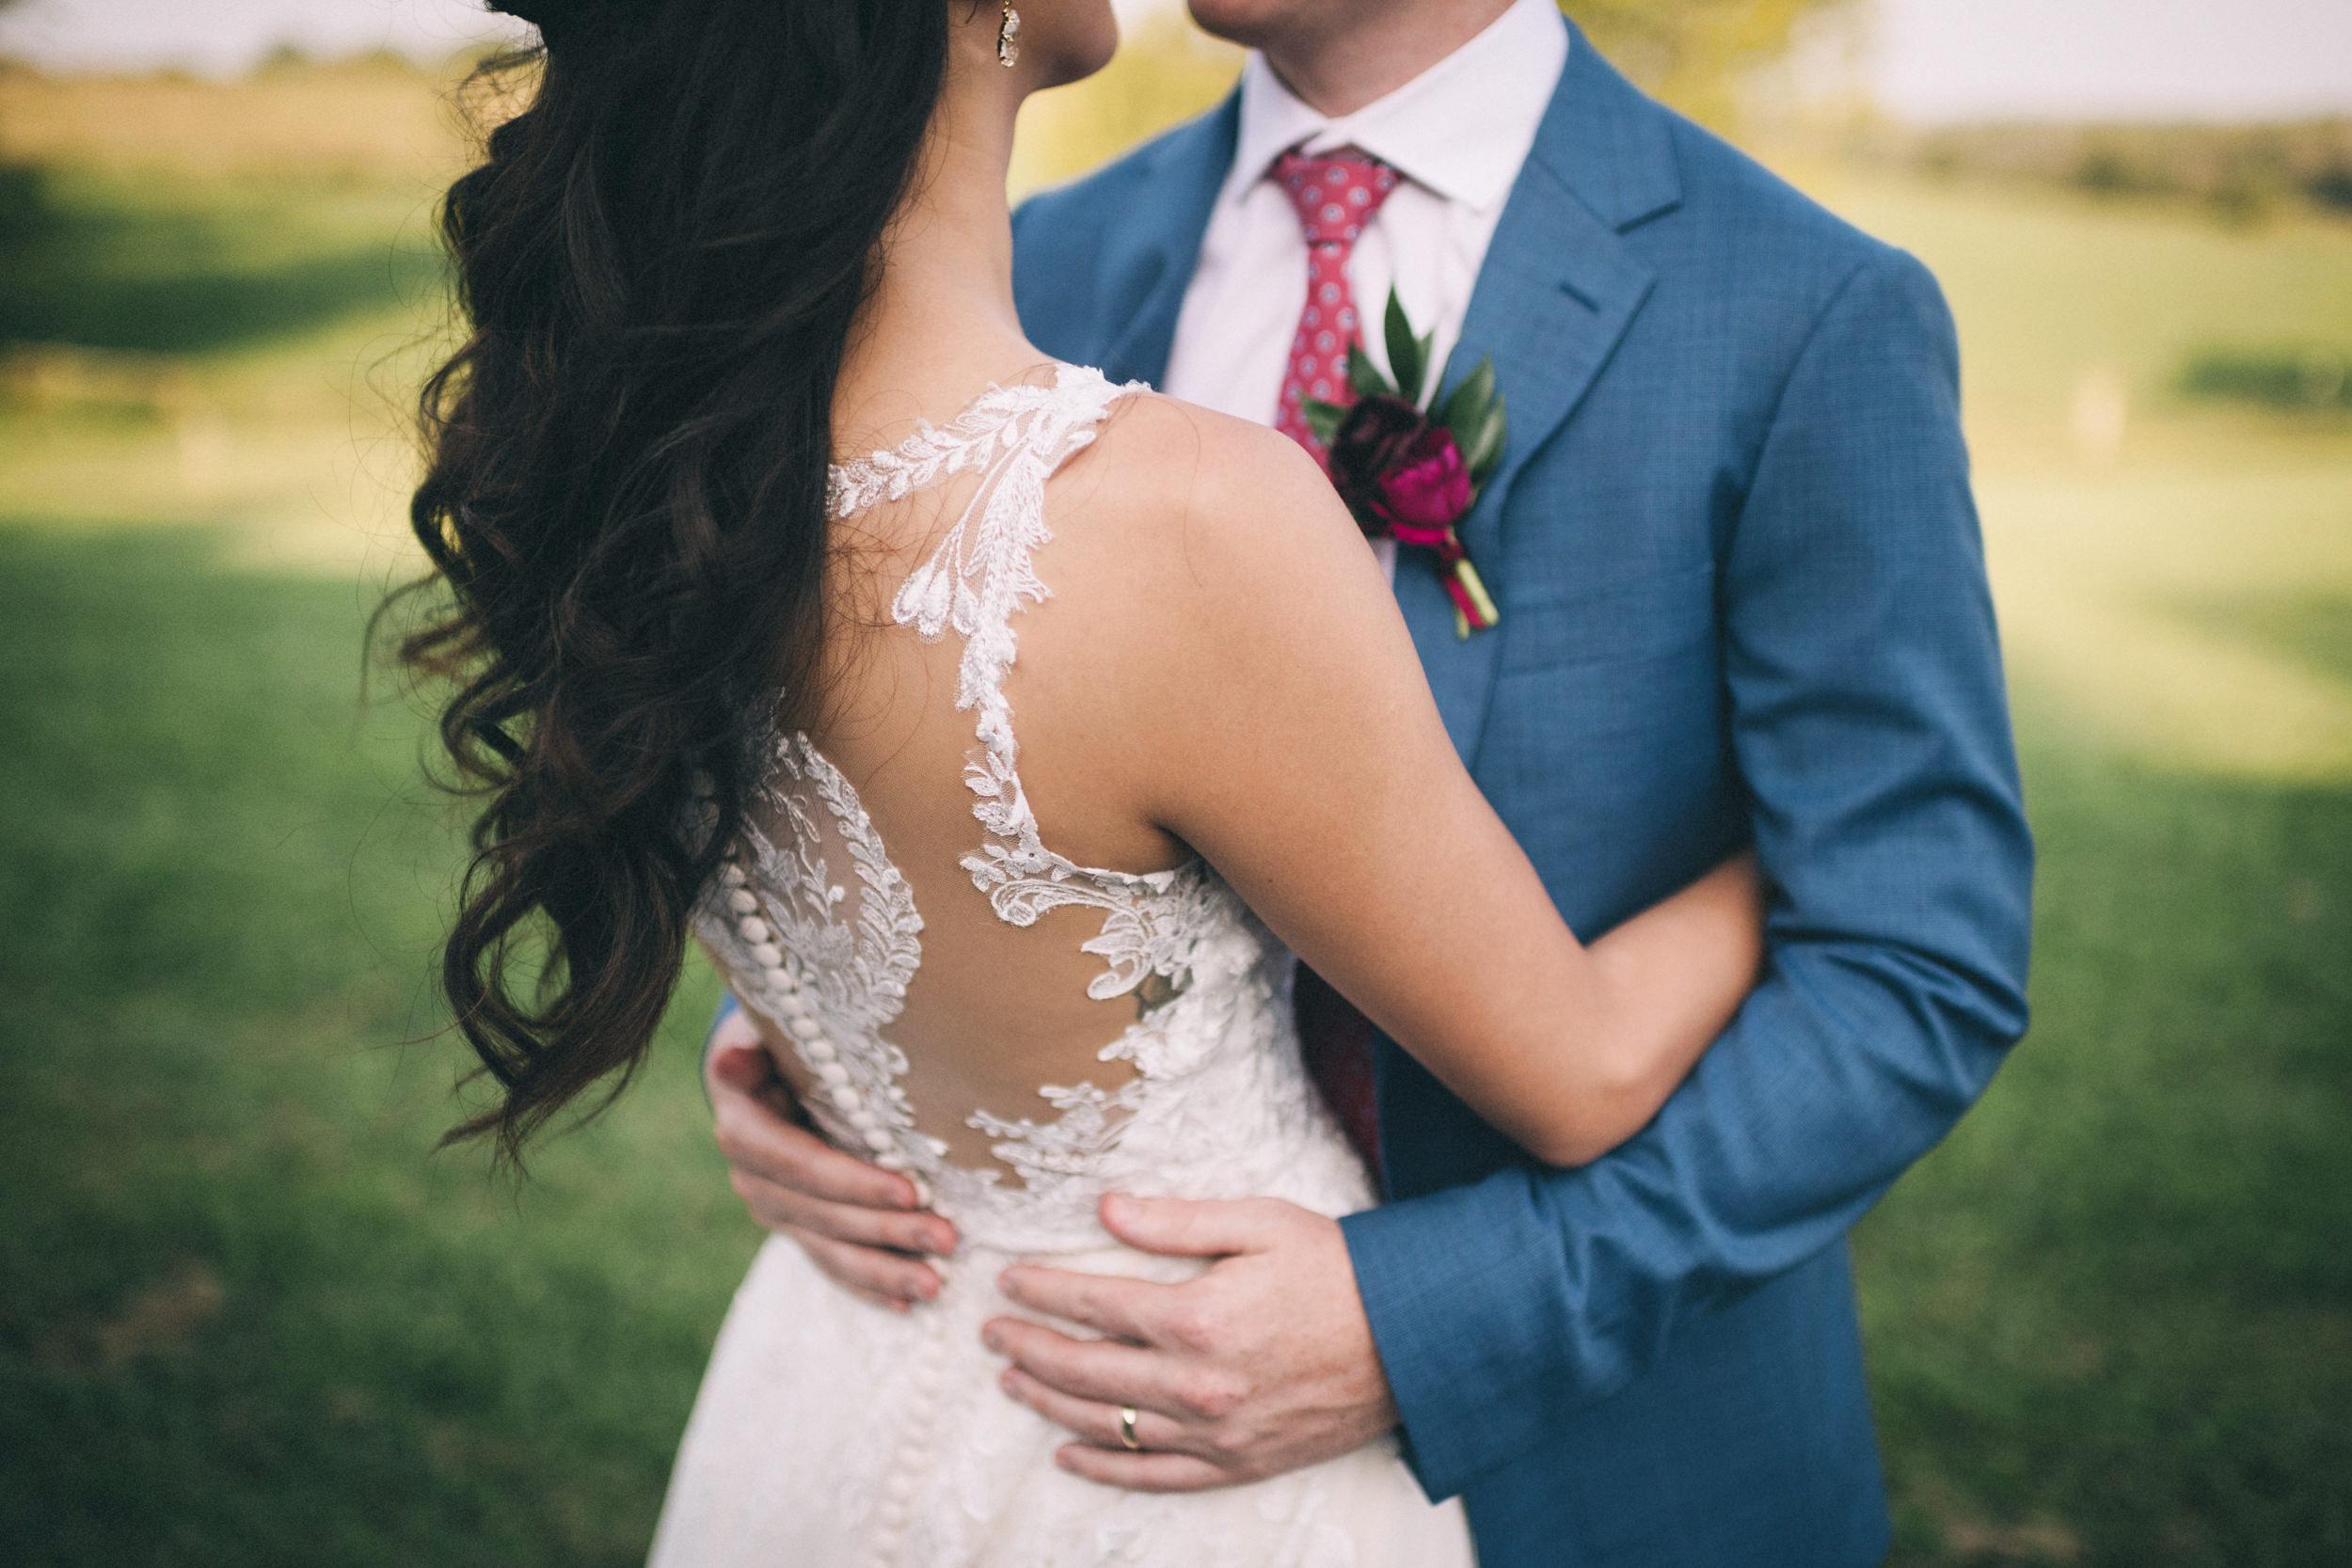 Louisville-Kentucky-Wedding-and-Elopement-Photographer-Sarah-Katherine-Davis-Photography-Summer-Jewel-Toned-Wedding-Chineese-Tea-Ceremony-Warrenwood-Manor-Danville-679.jpg